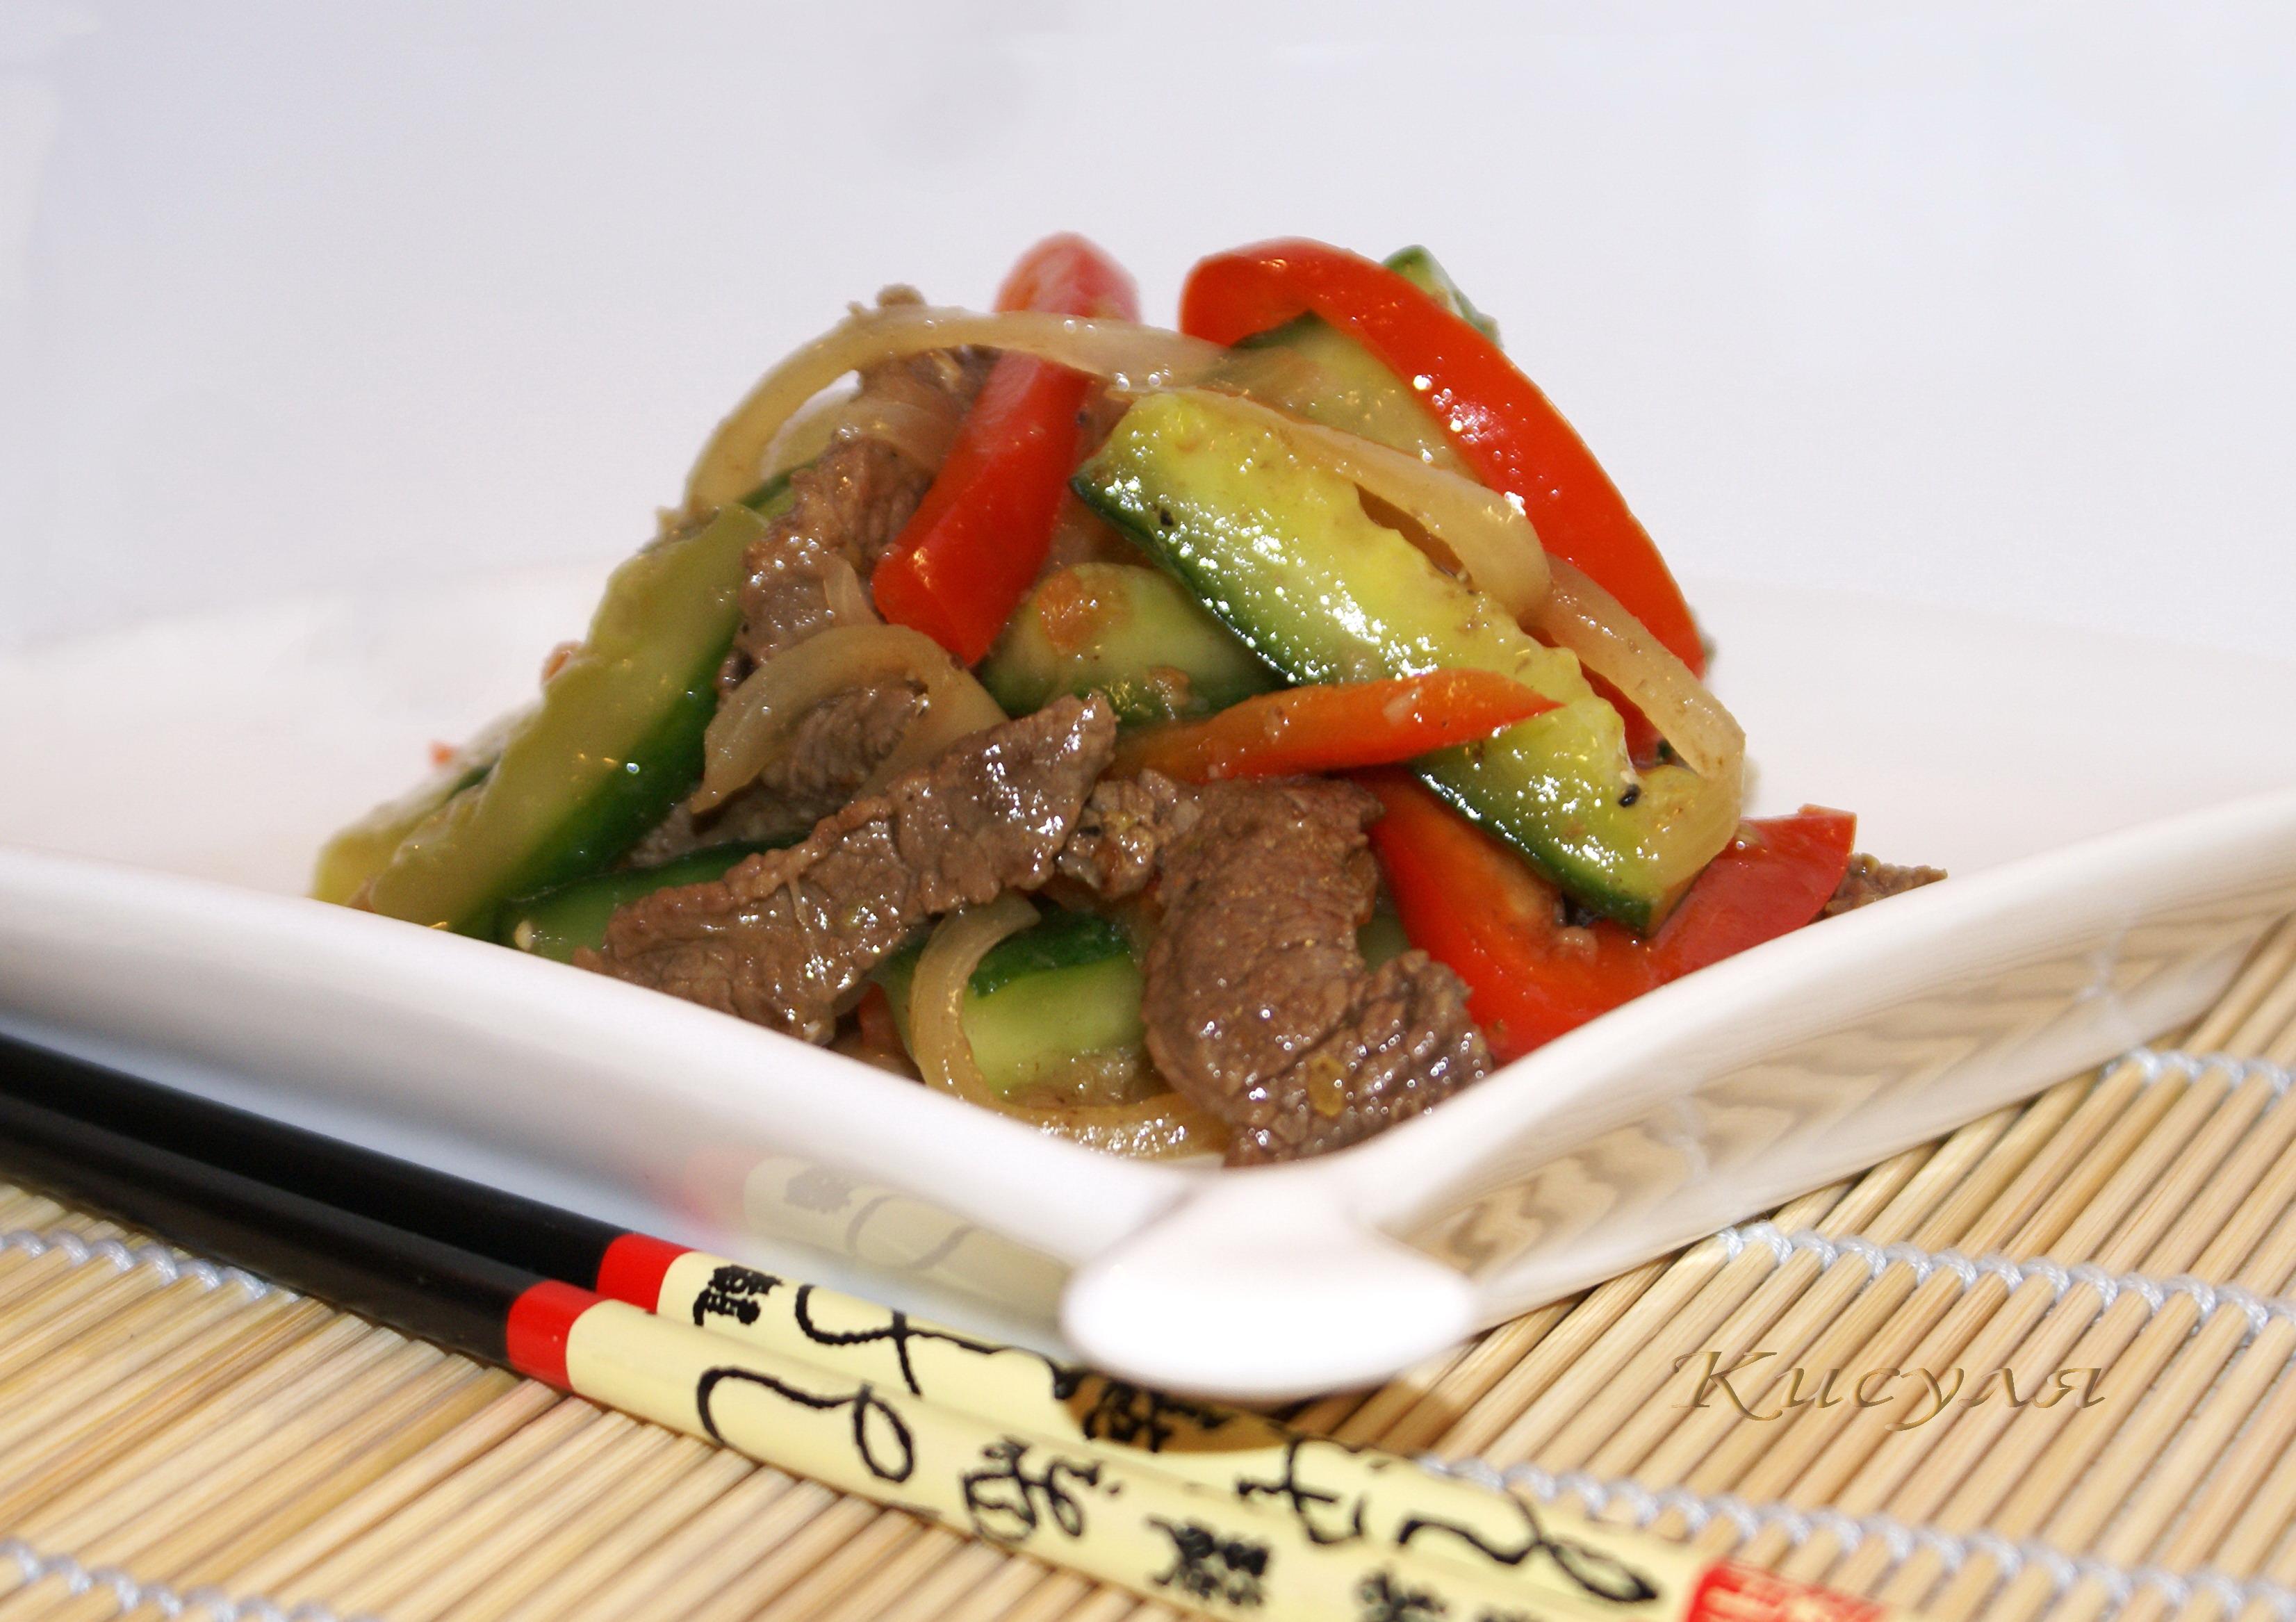 Салат корейский с мясом и свежими огурцами с